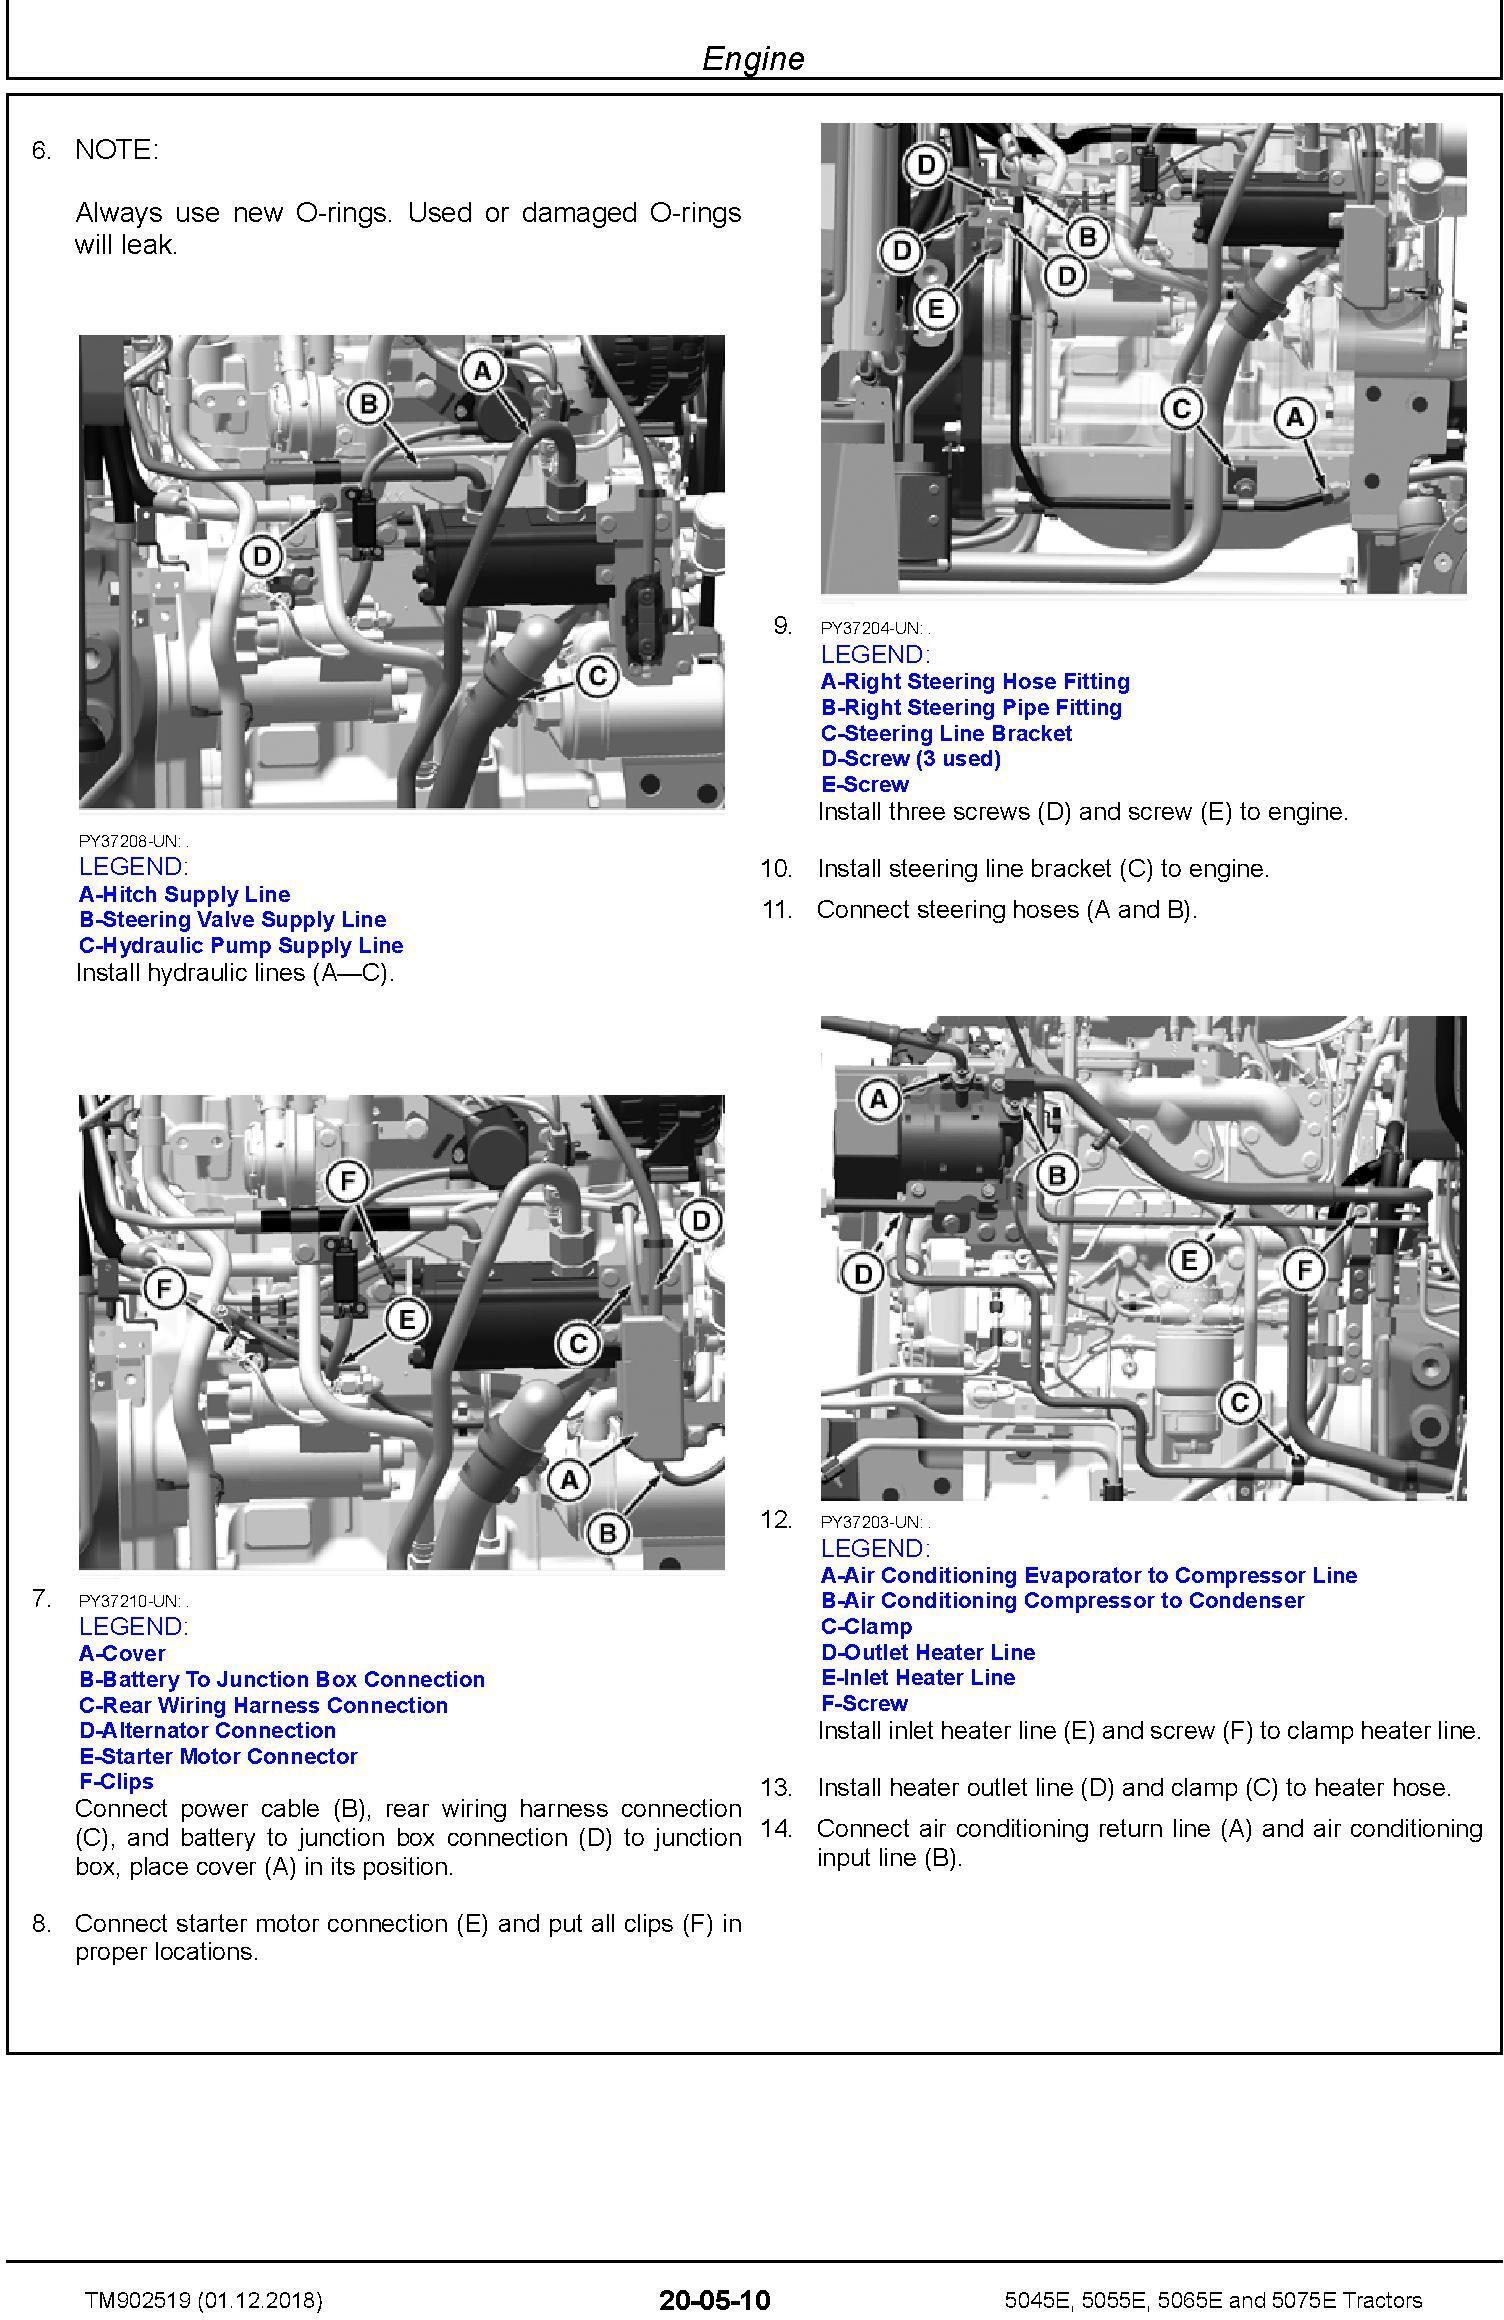 John Deere 5045E, 5055E, 5065E, 5075E Tractors (SN.103101-) Repair Technical Service Manual TM902519 - 1